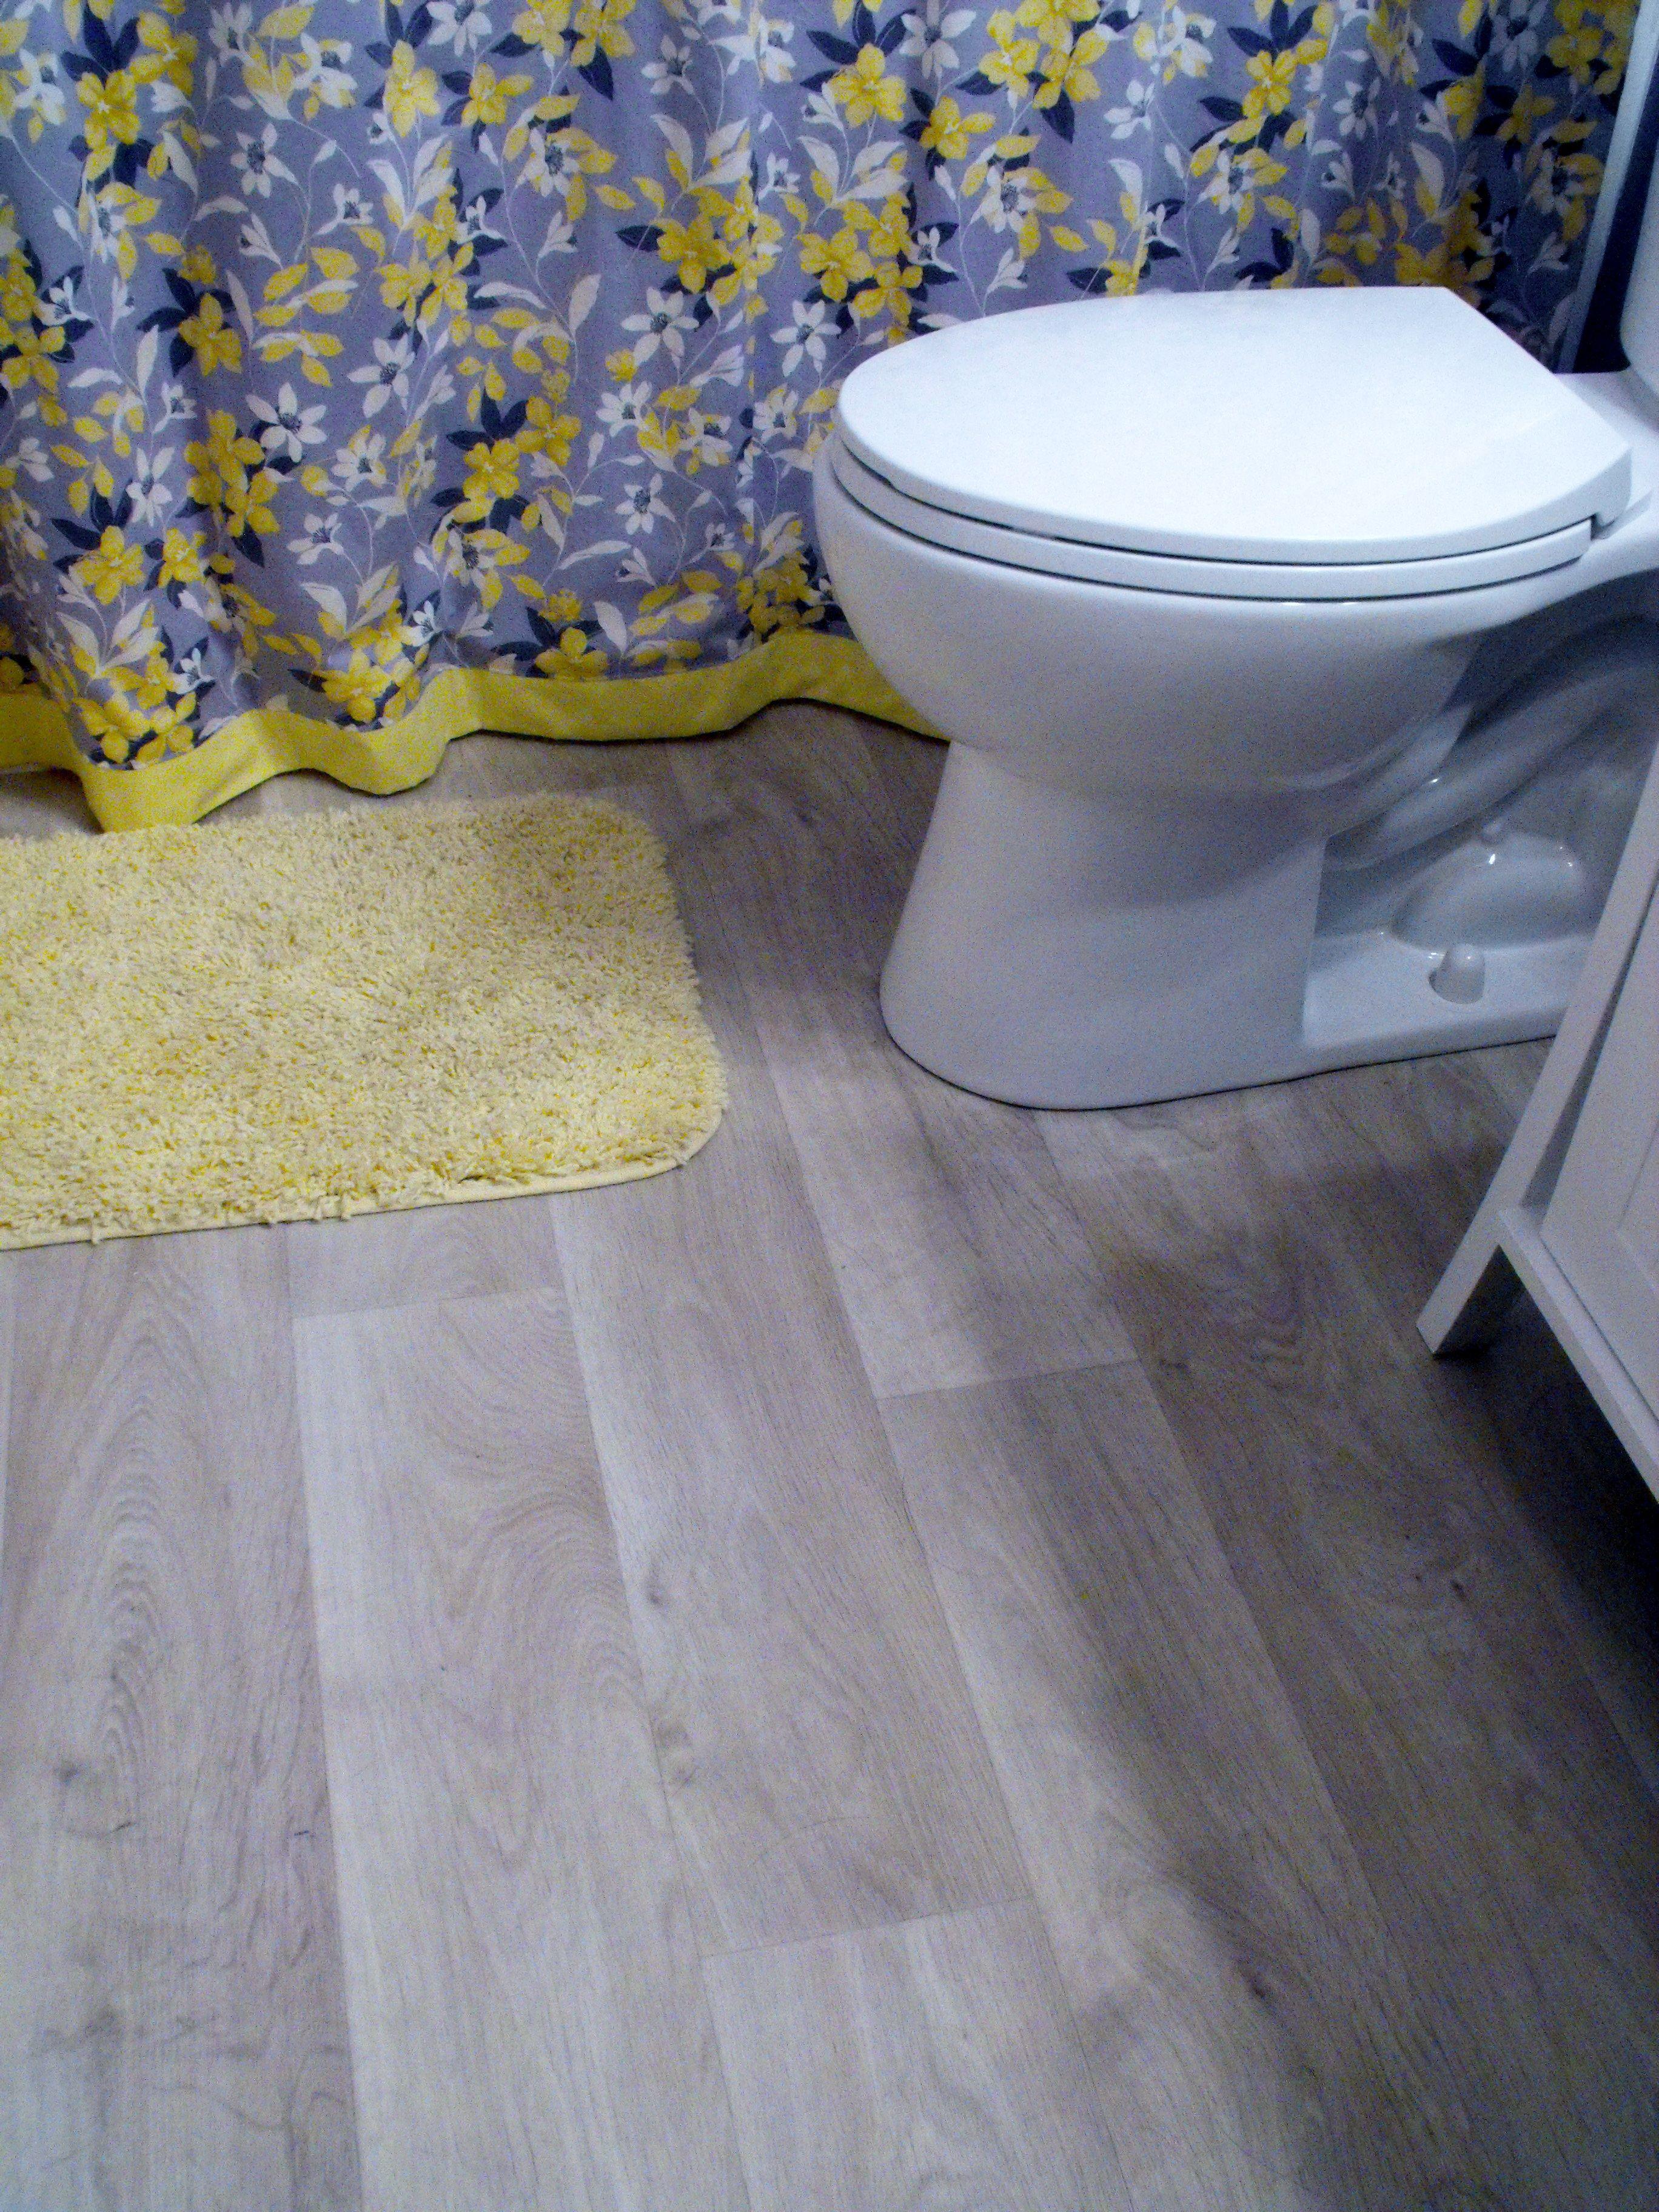 This Is The New Finished Floor It Looks Like Whitewash Wood Planks - New bathroom looks